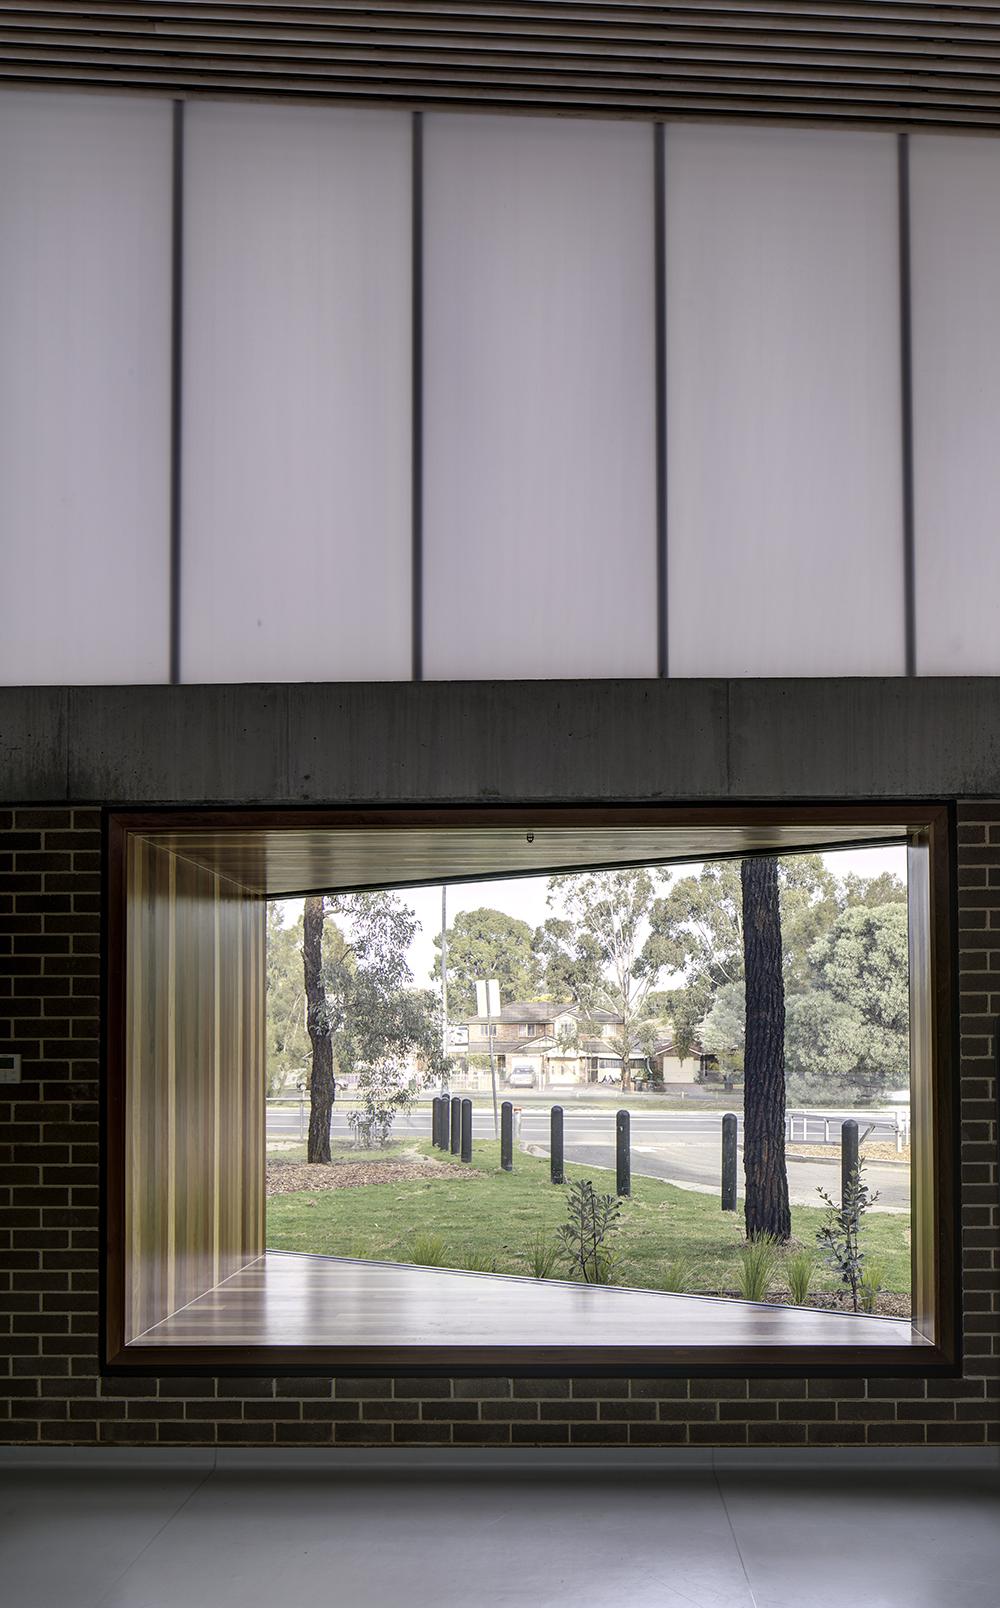 4867-interior_Woodcroft Neighbourhood Centre_Carter Williamson_Brett Boardman_8